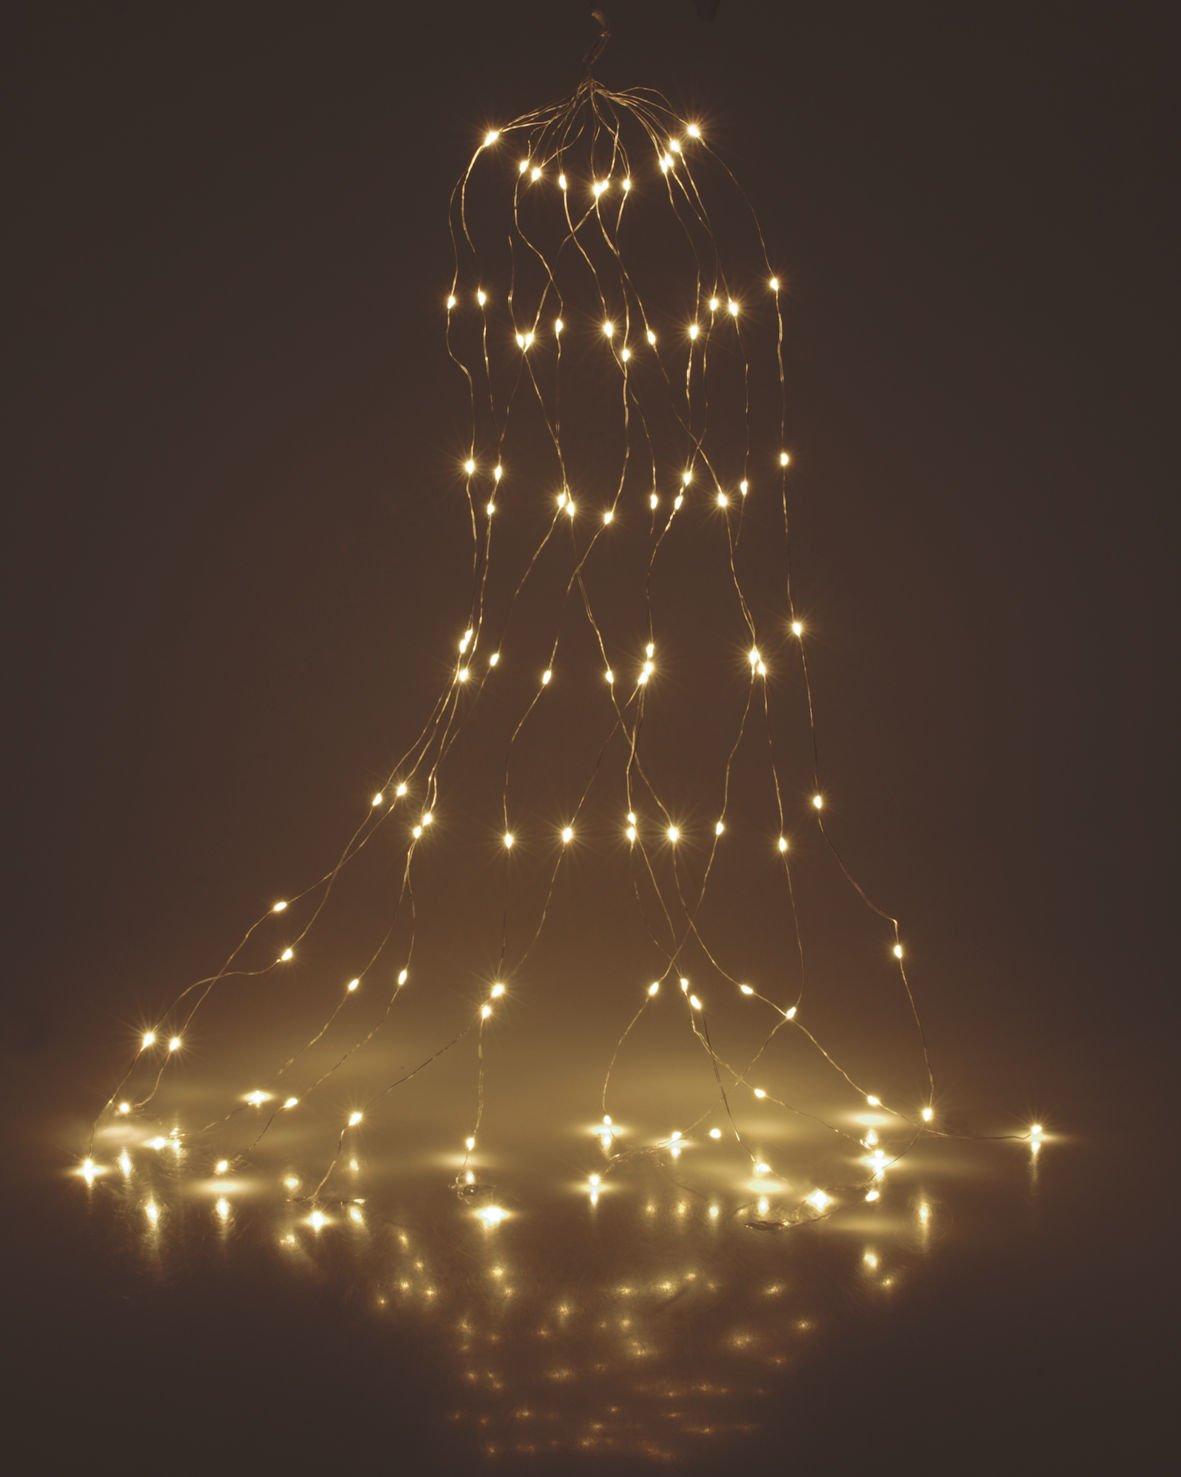 Draht-Lichterbndel-300-LED-warmwei-10×30-LED-3m-Micro-Lichterkette-Leuchtdraht-Auen